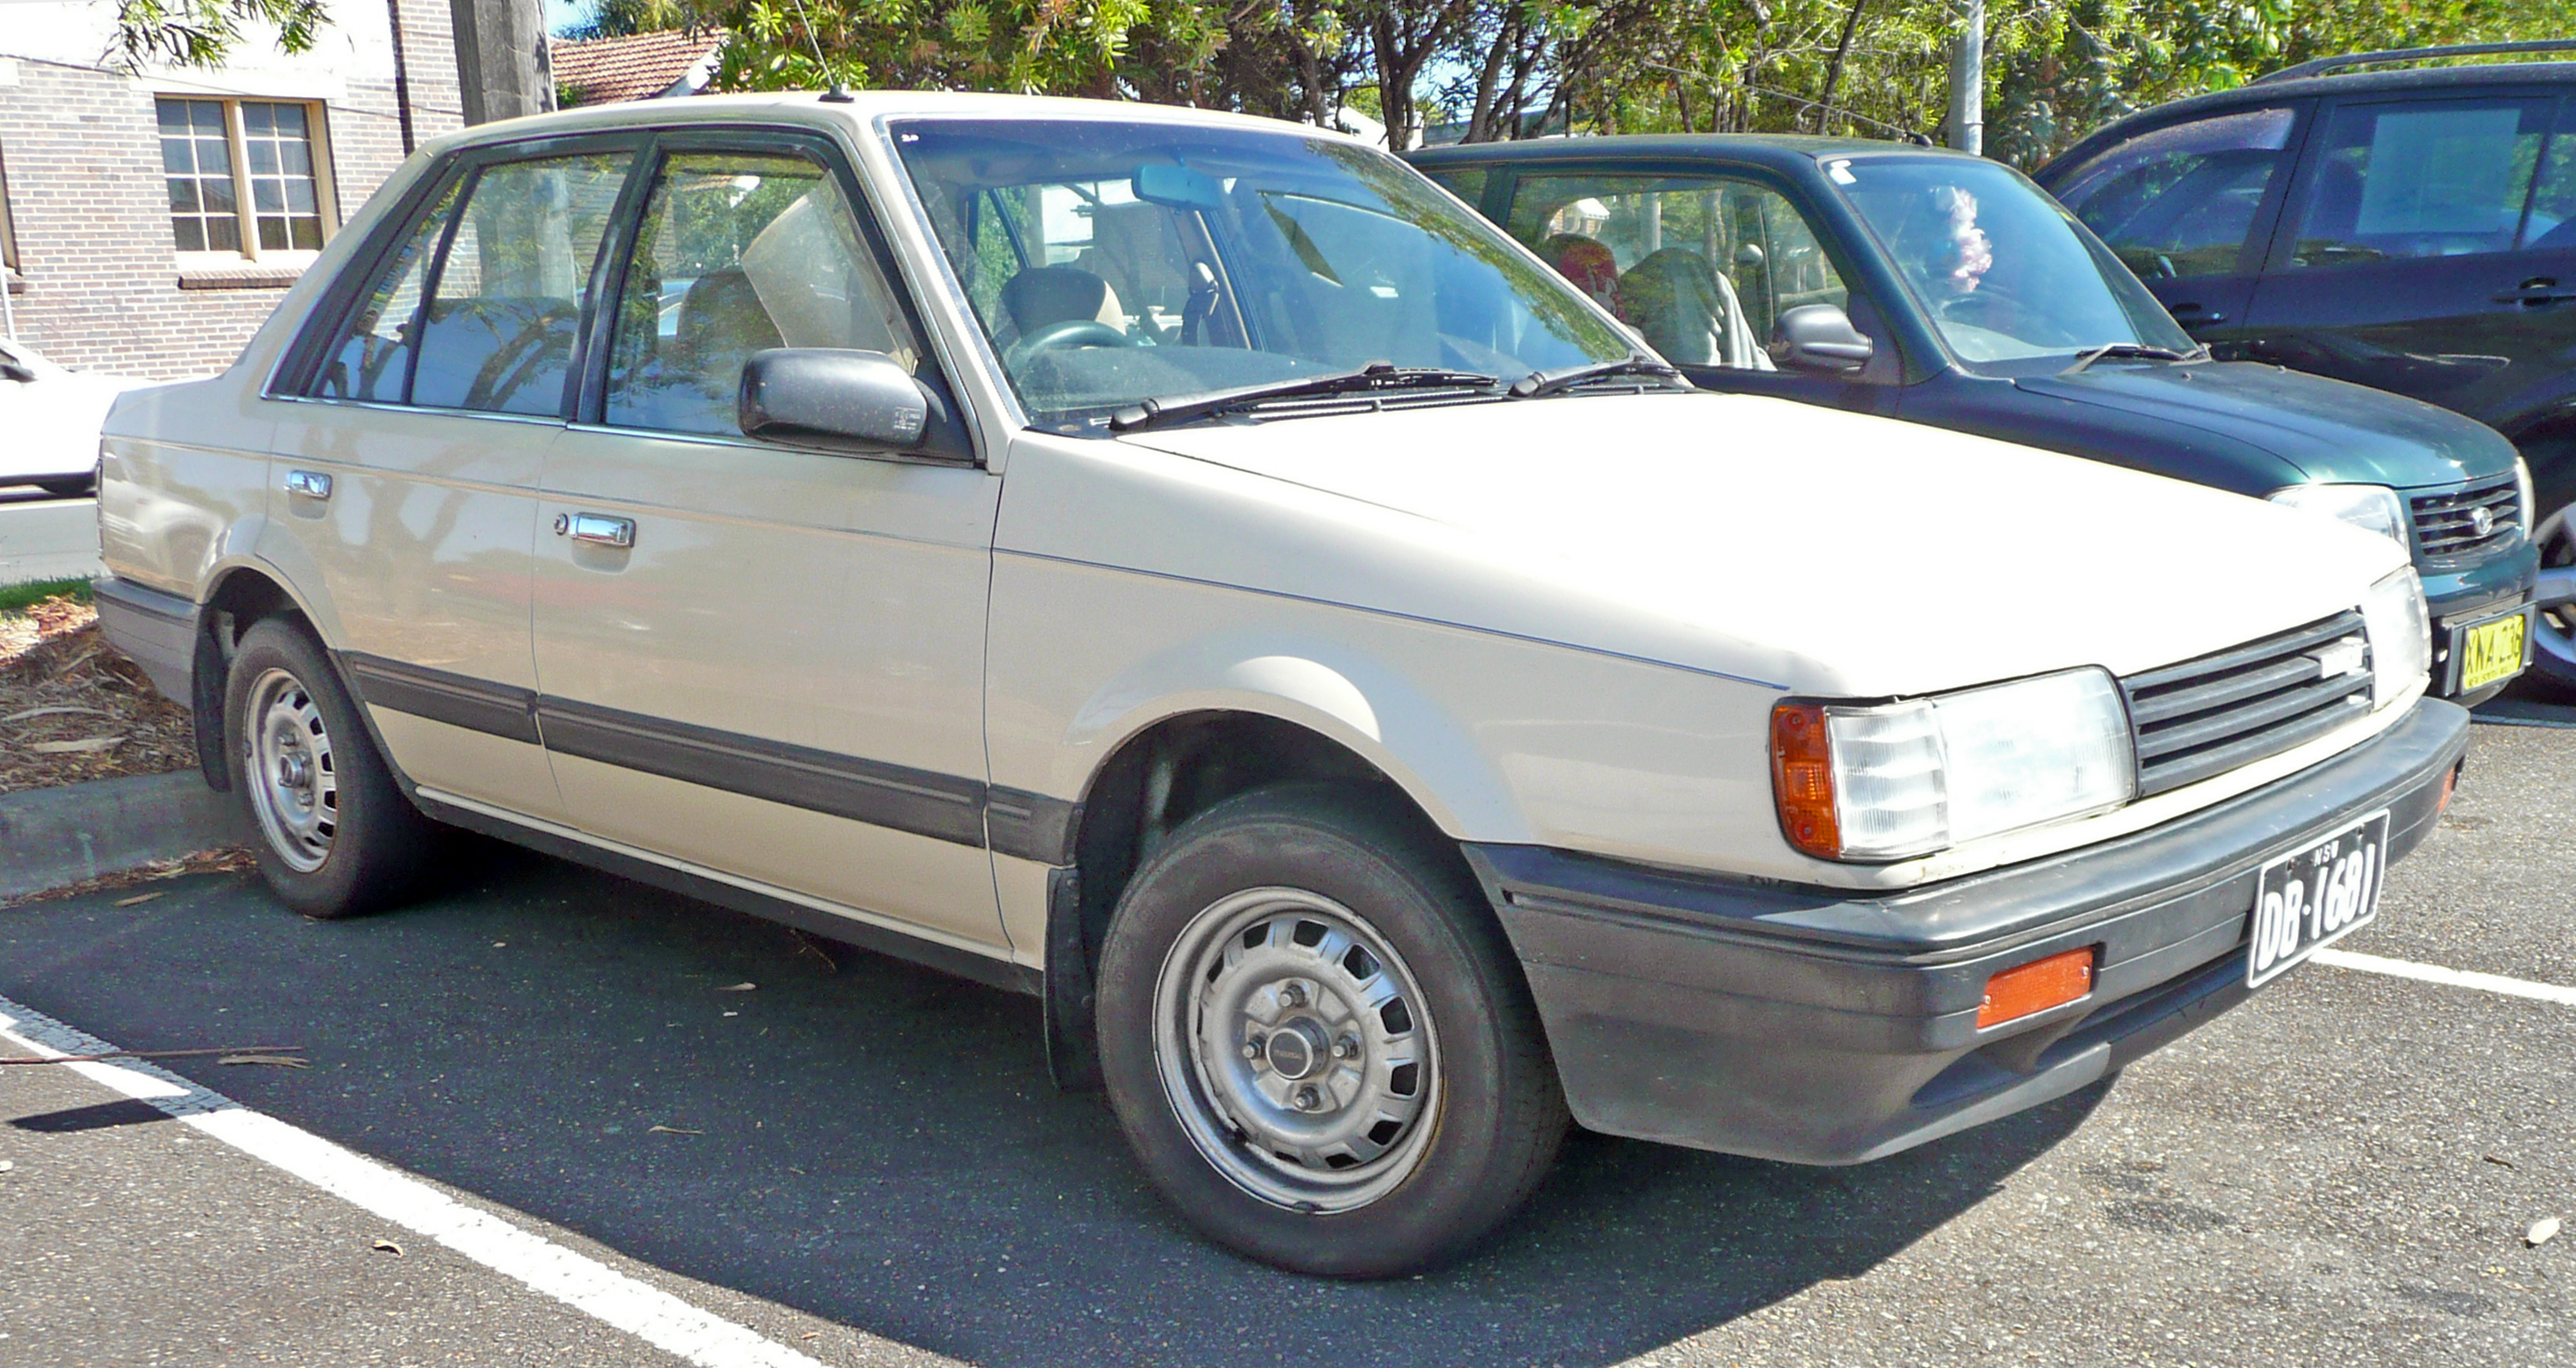 mazda 323 iii bf 1985 1989 station wagon 5 door outstanding cars rh carsot com Manual Mazda 325 Mazda Auto Repair Manual